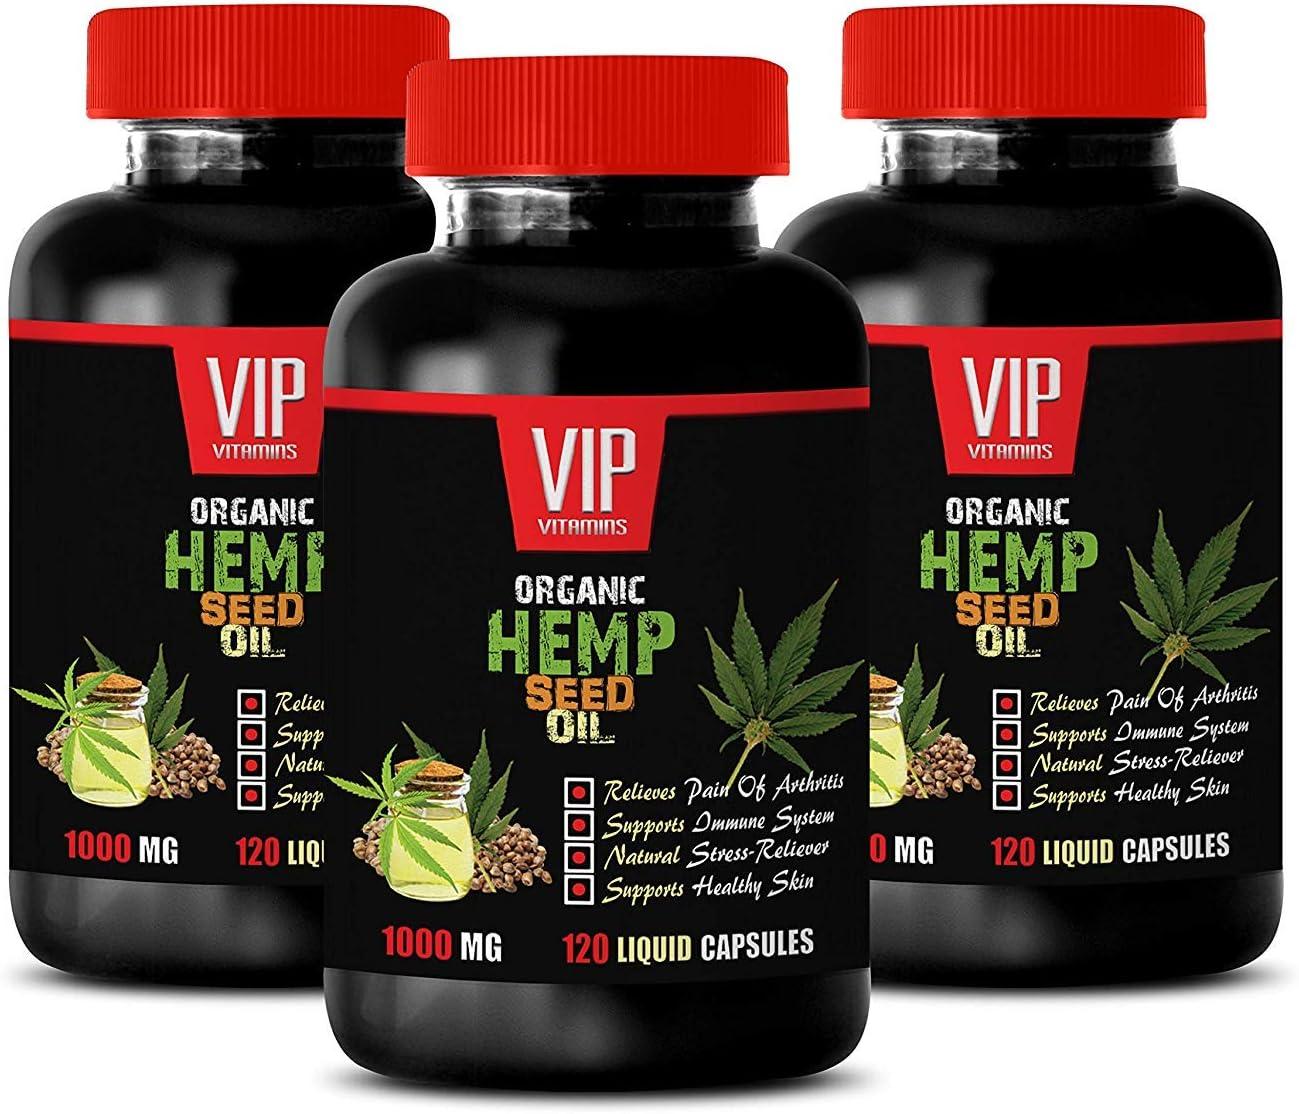 Anti inflammatory Pills - Organic Hemp Seed Oil 1000MG - Pain Relief - Brain and Heart Health - Fatty acids Oil - 3 Bottle (360 Liquid Caps)